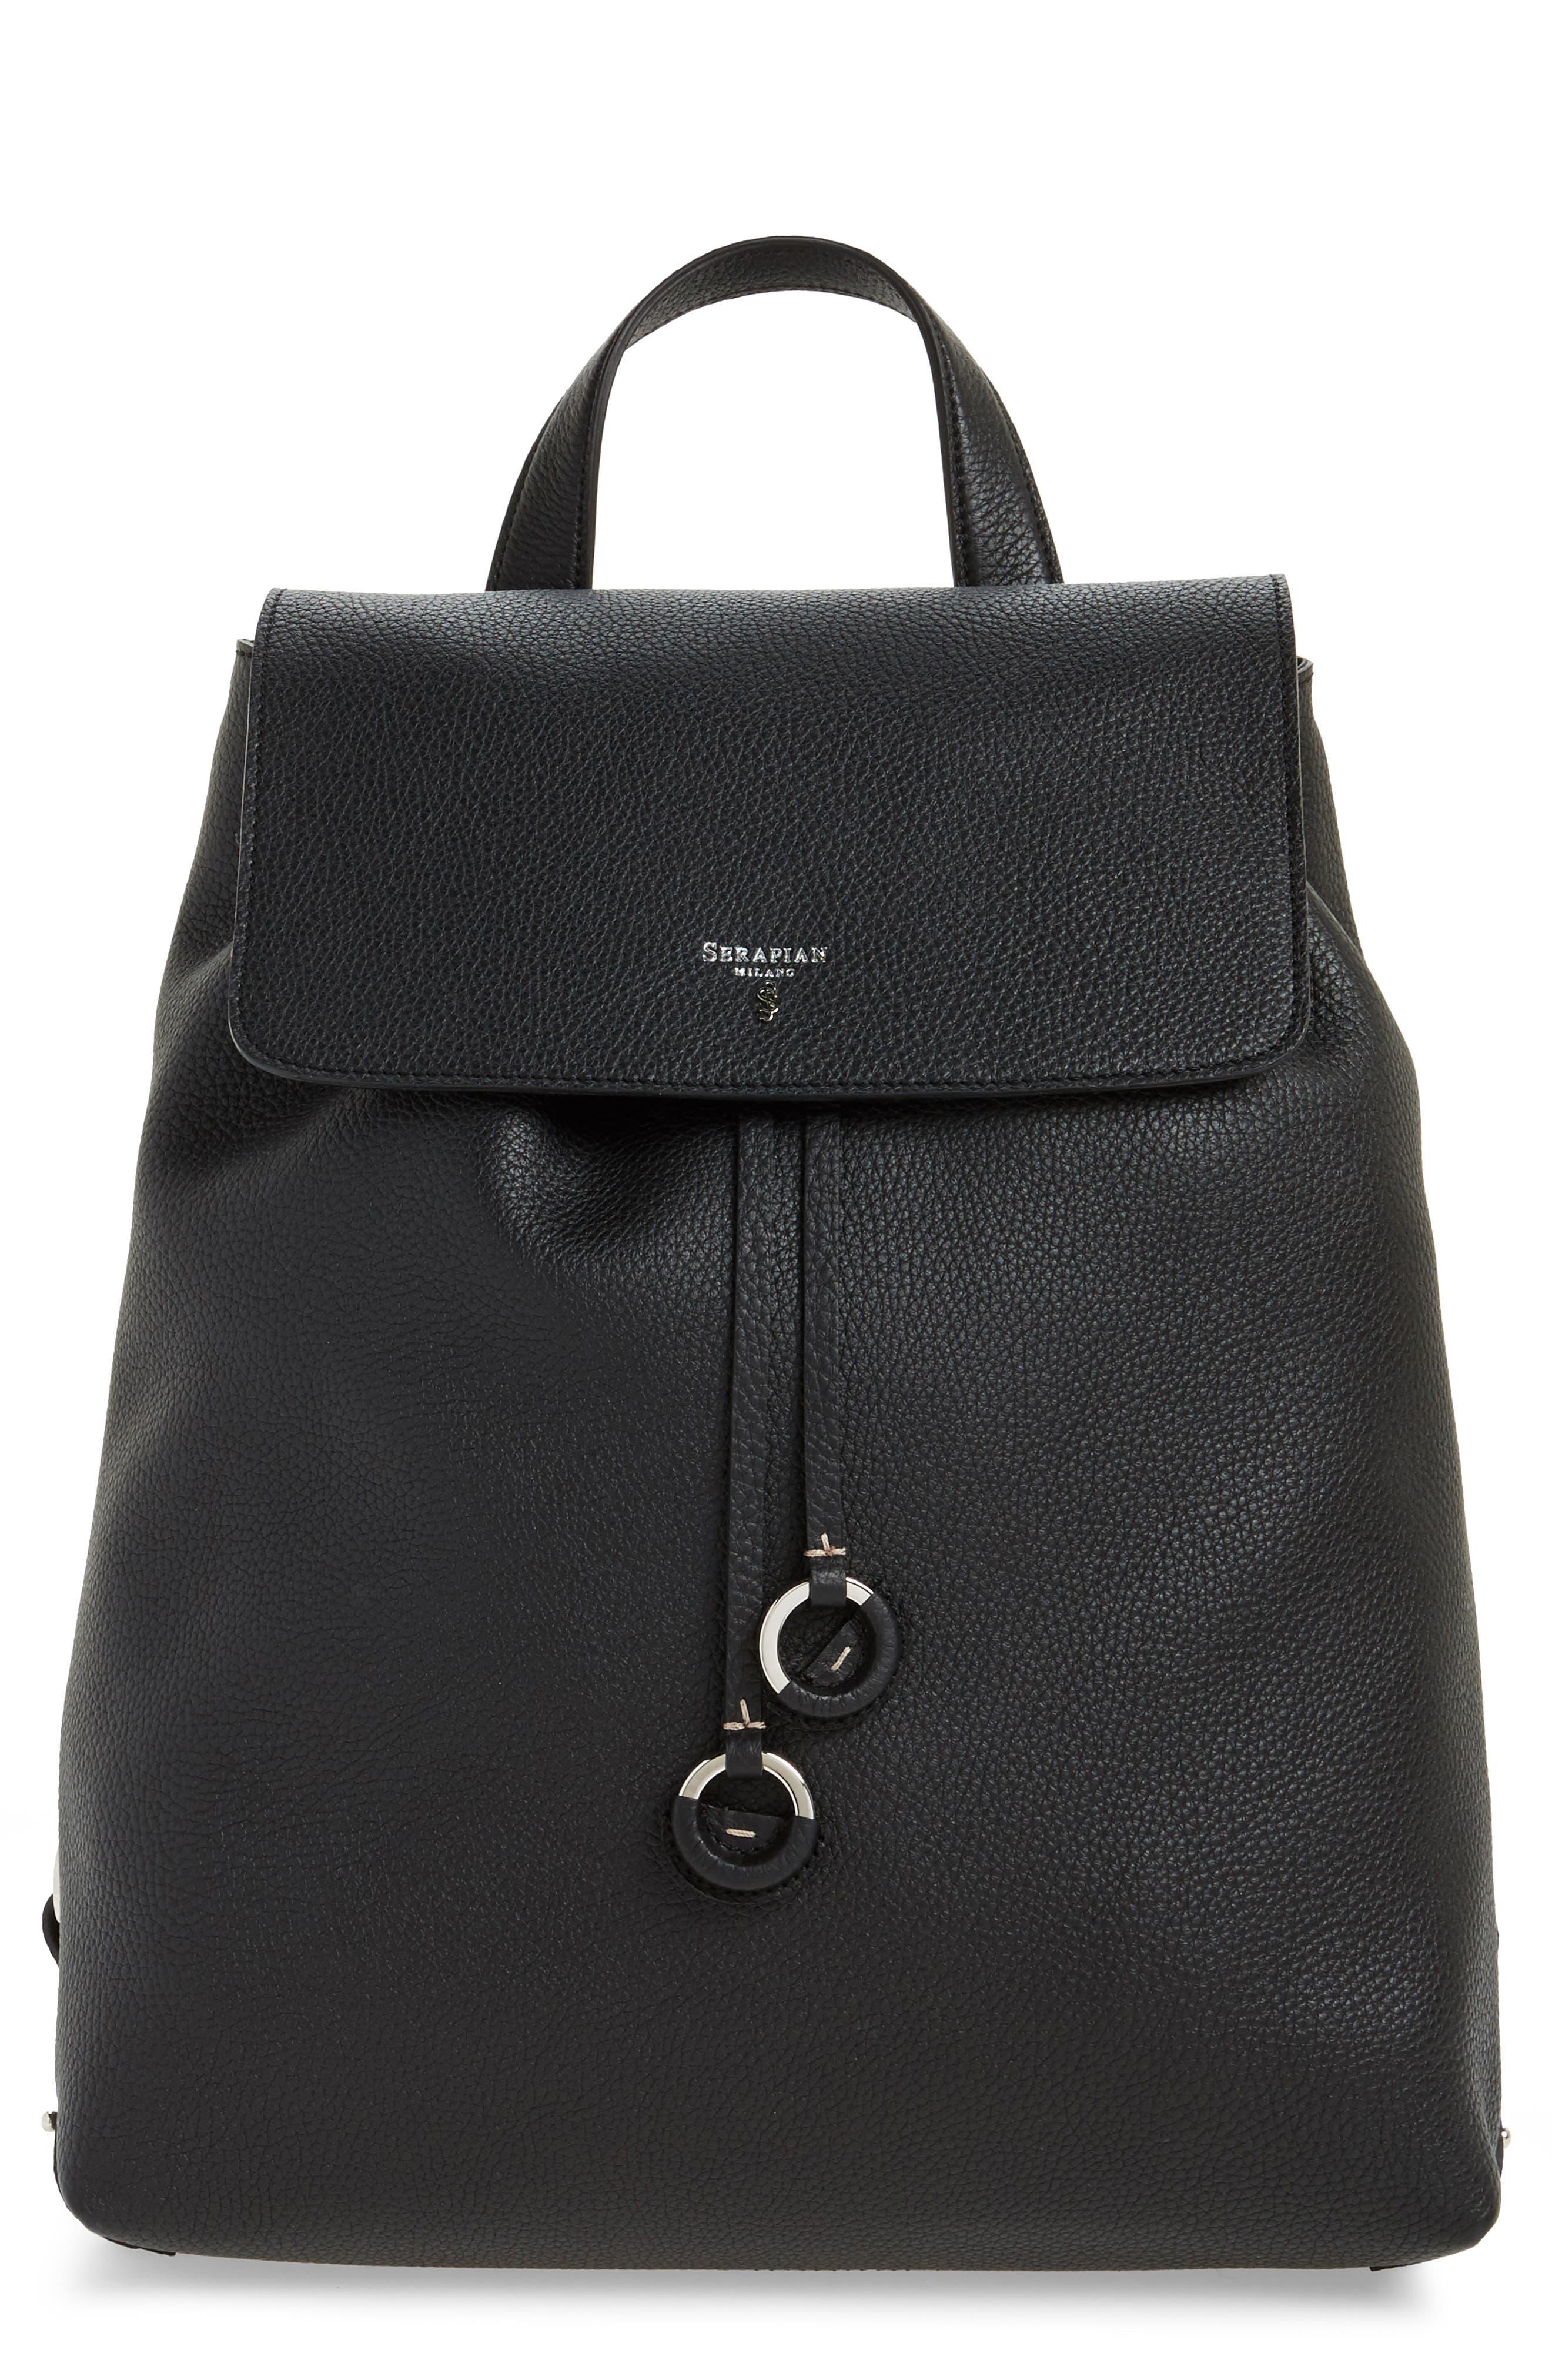 Carmen Cachemire Leather Backpack,                             Main thumbnail 1, color,                             Black